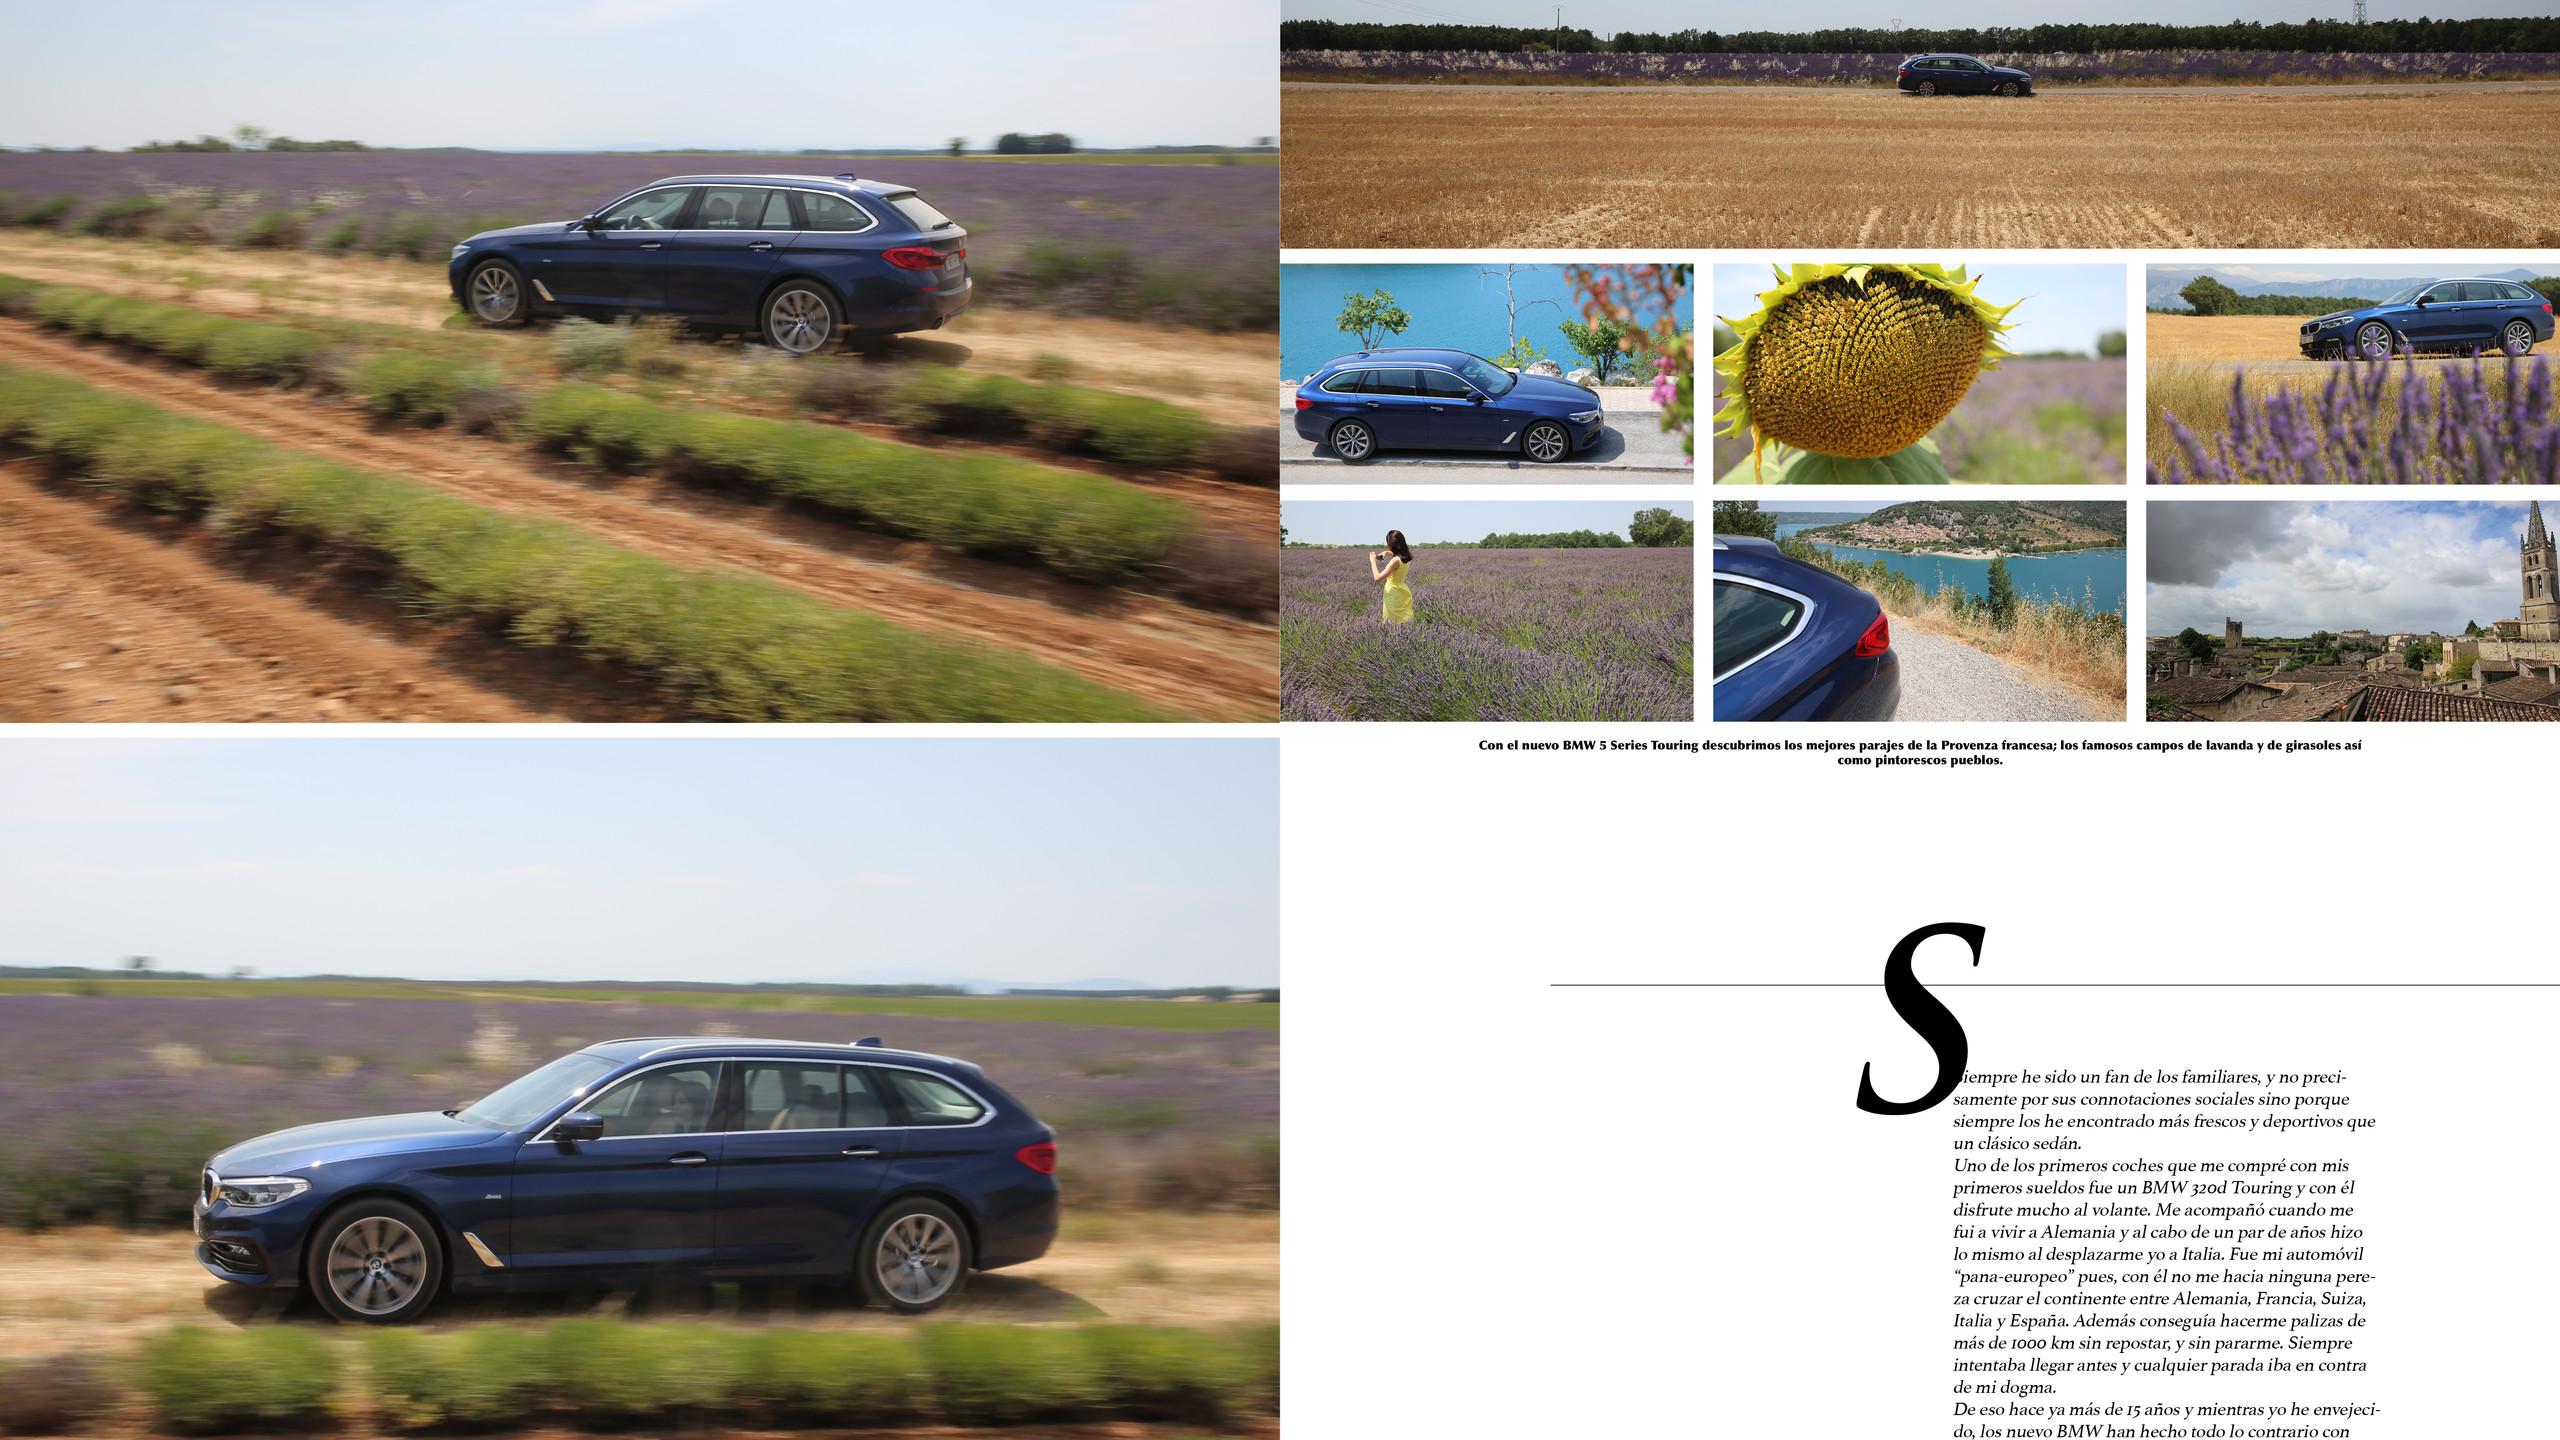 DRIVE28-BMW 5 Series Touring